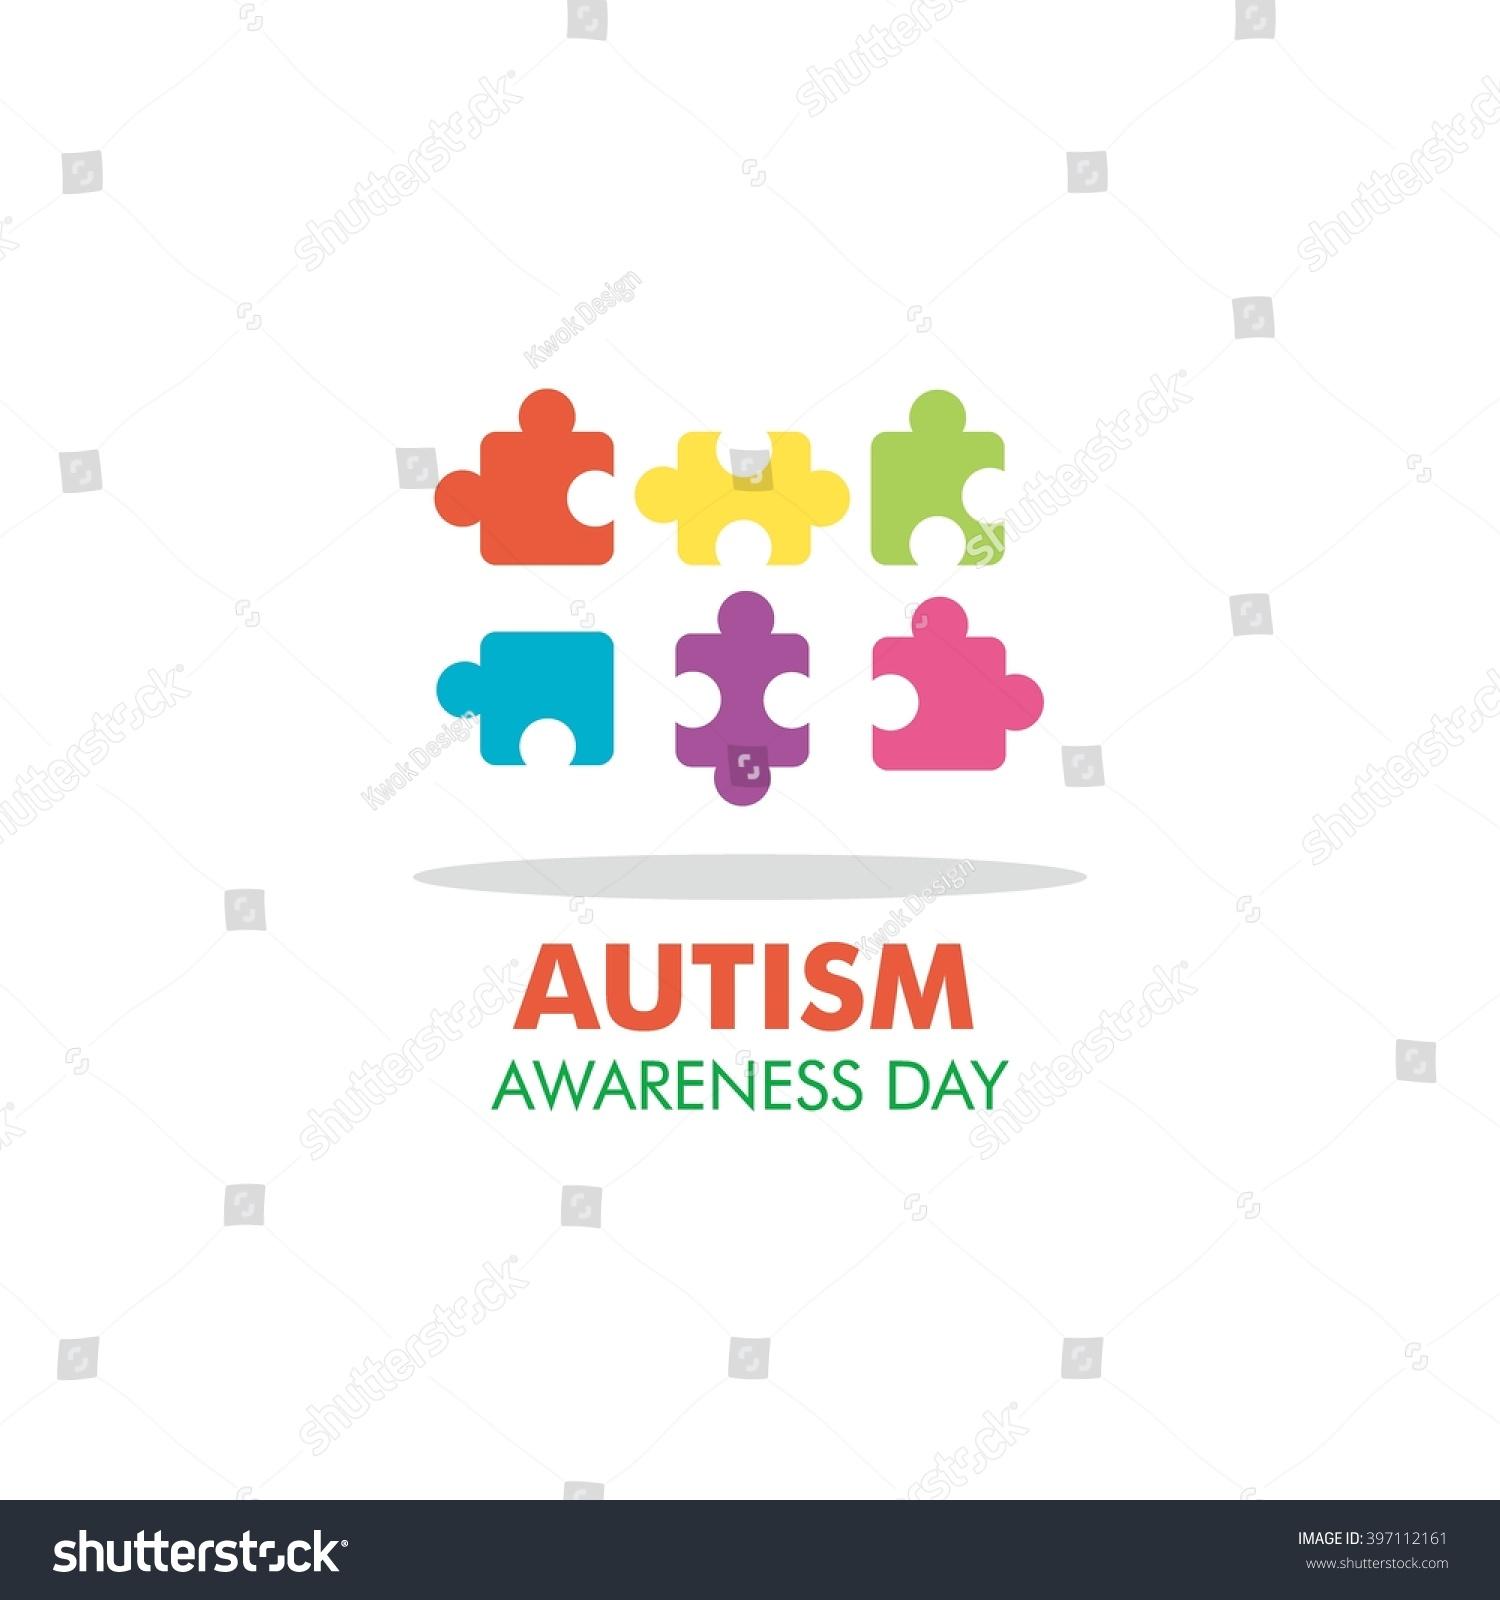 World autism awareness day logo design stock vector 397112161 world autism awareness day logo design template vector illustration colorful puzzles symbol biocorpaavc